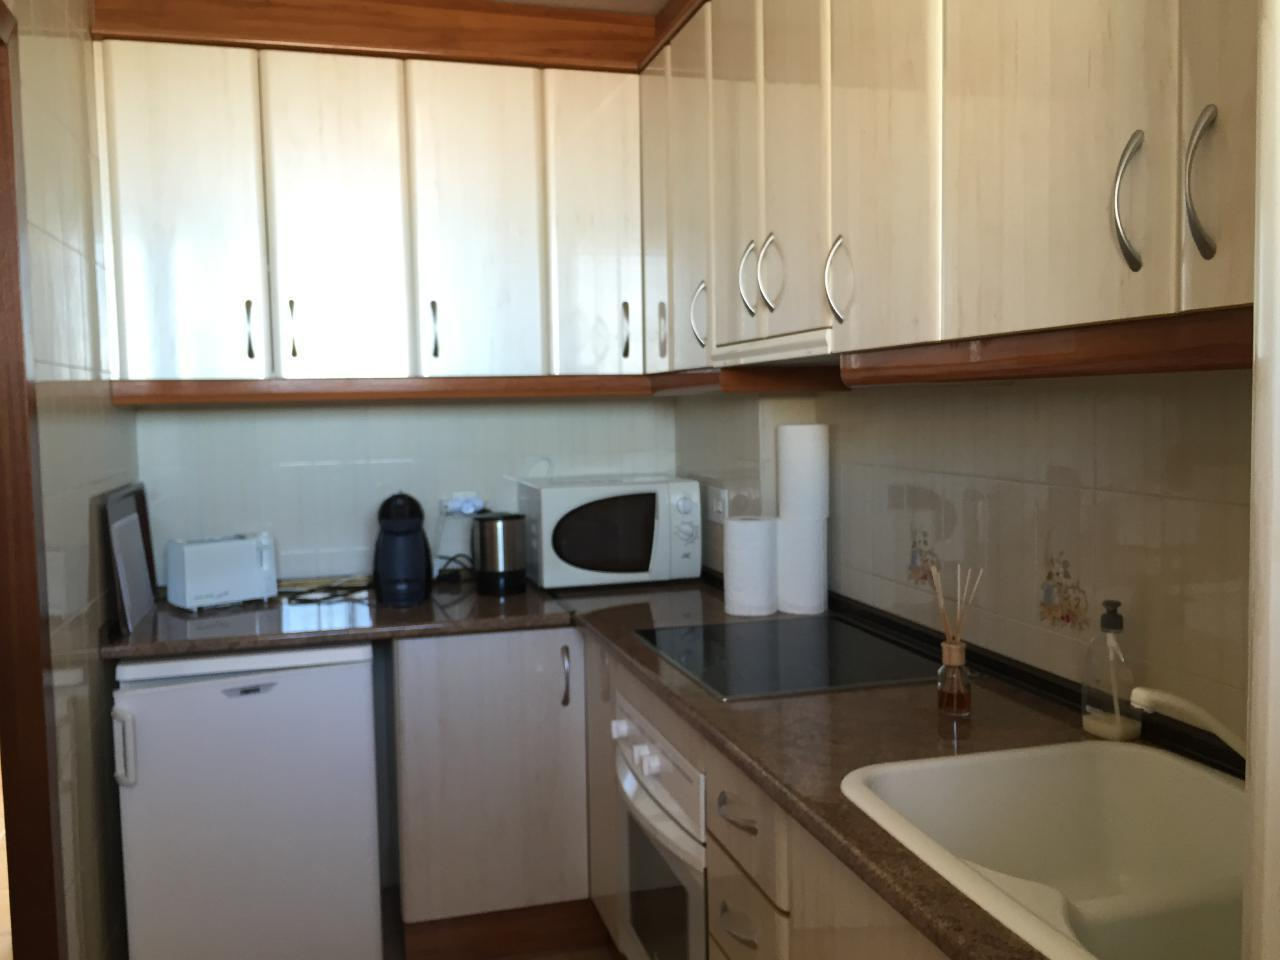 Appartement de vacances Sonnige 3.5 Zi-Wohnung am Meer (1026876), Torrevieja, Costa Blanca, Valence, Espagne, image 18